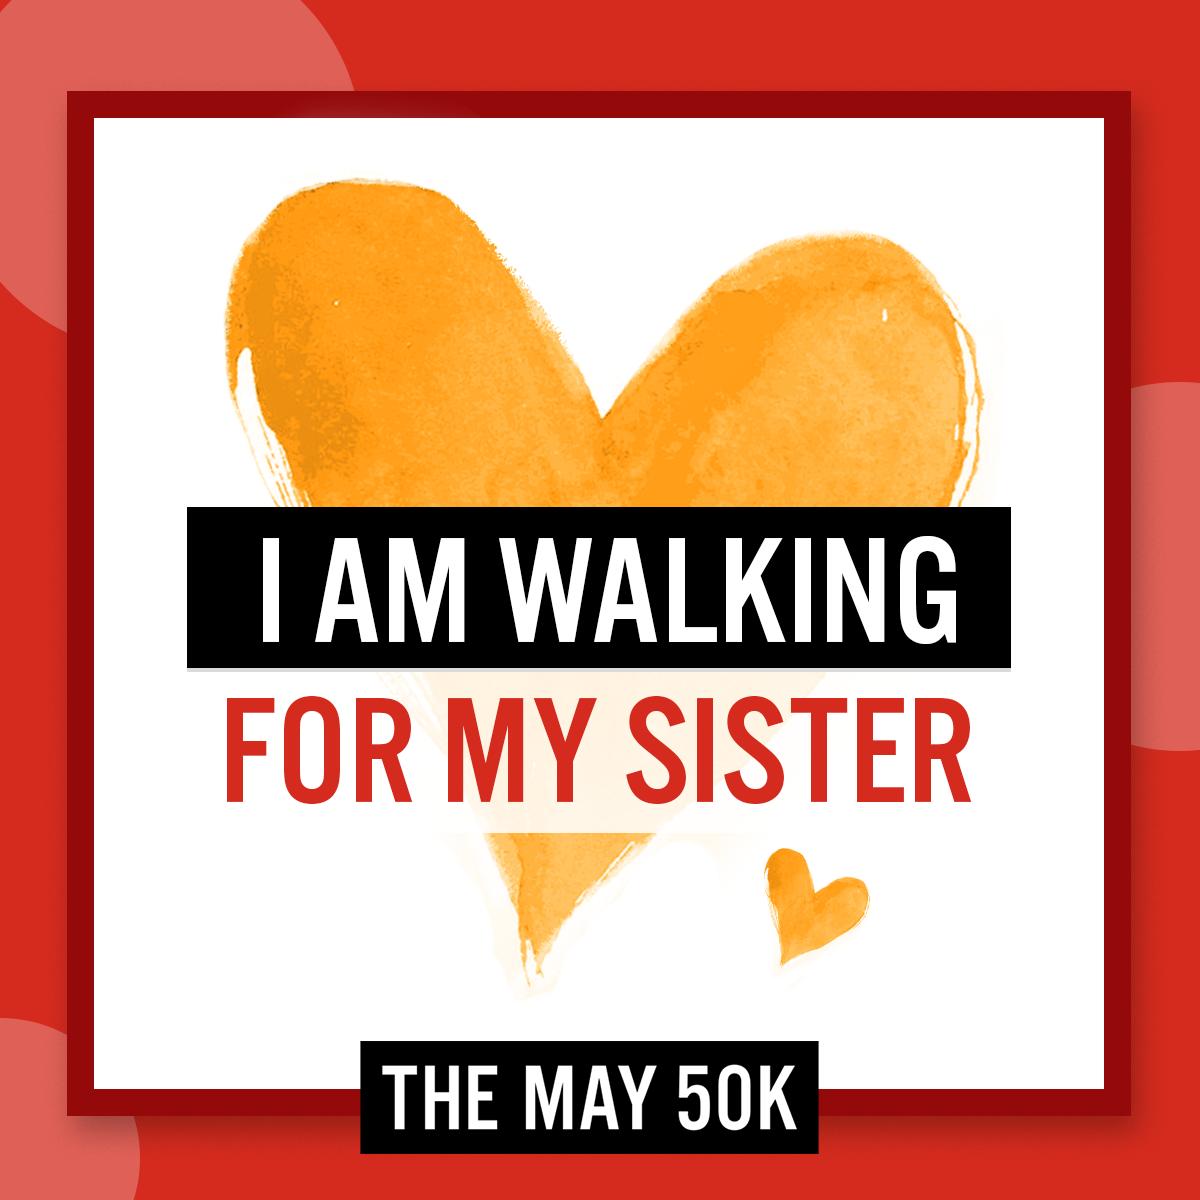 Social Posts - Walk For Sister